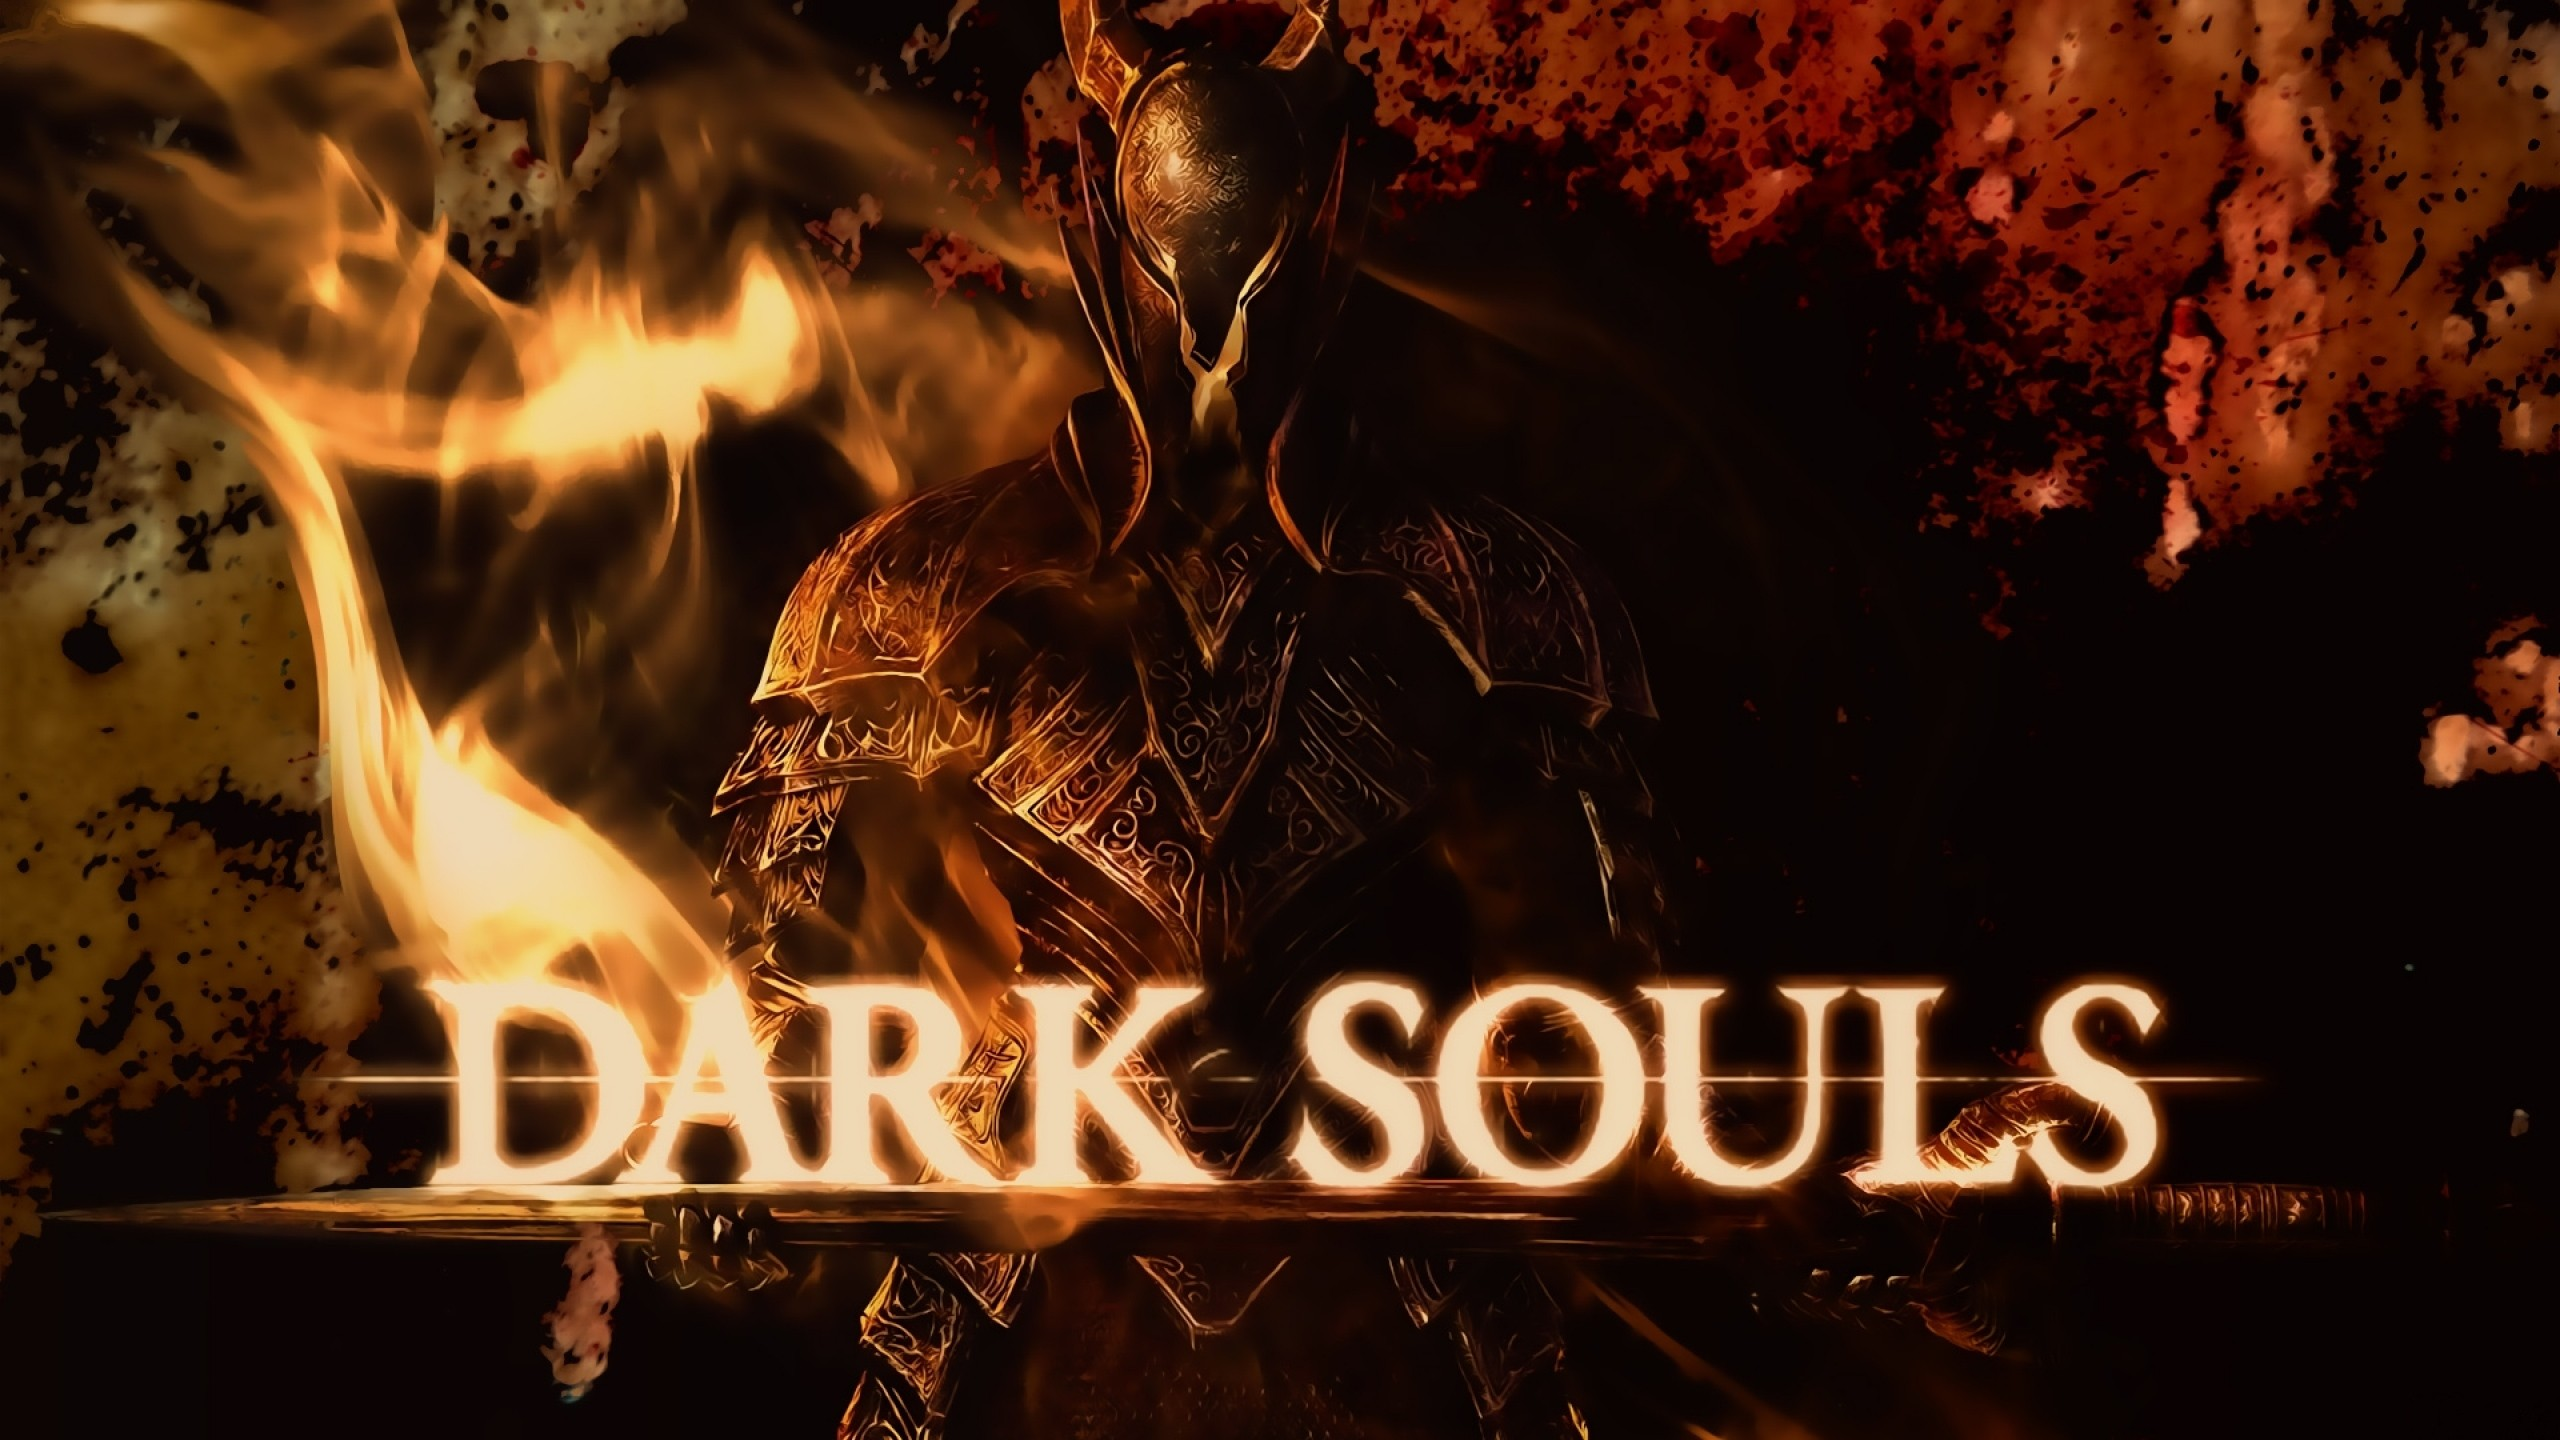 Dark Souls Background 1920x1080: 43+ Dark Souls Wallpapers ·① Download Free Stunning HD